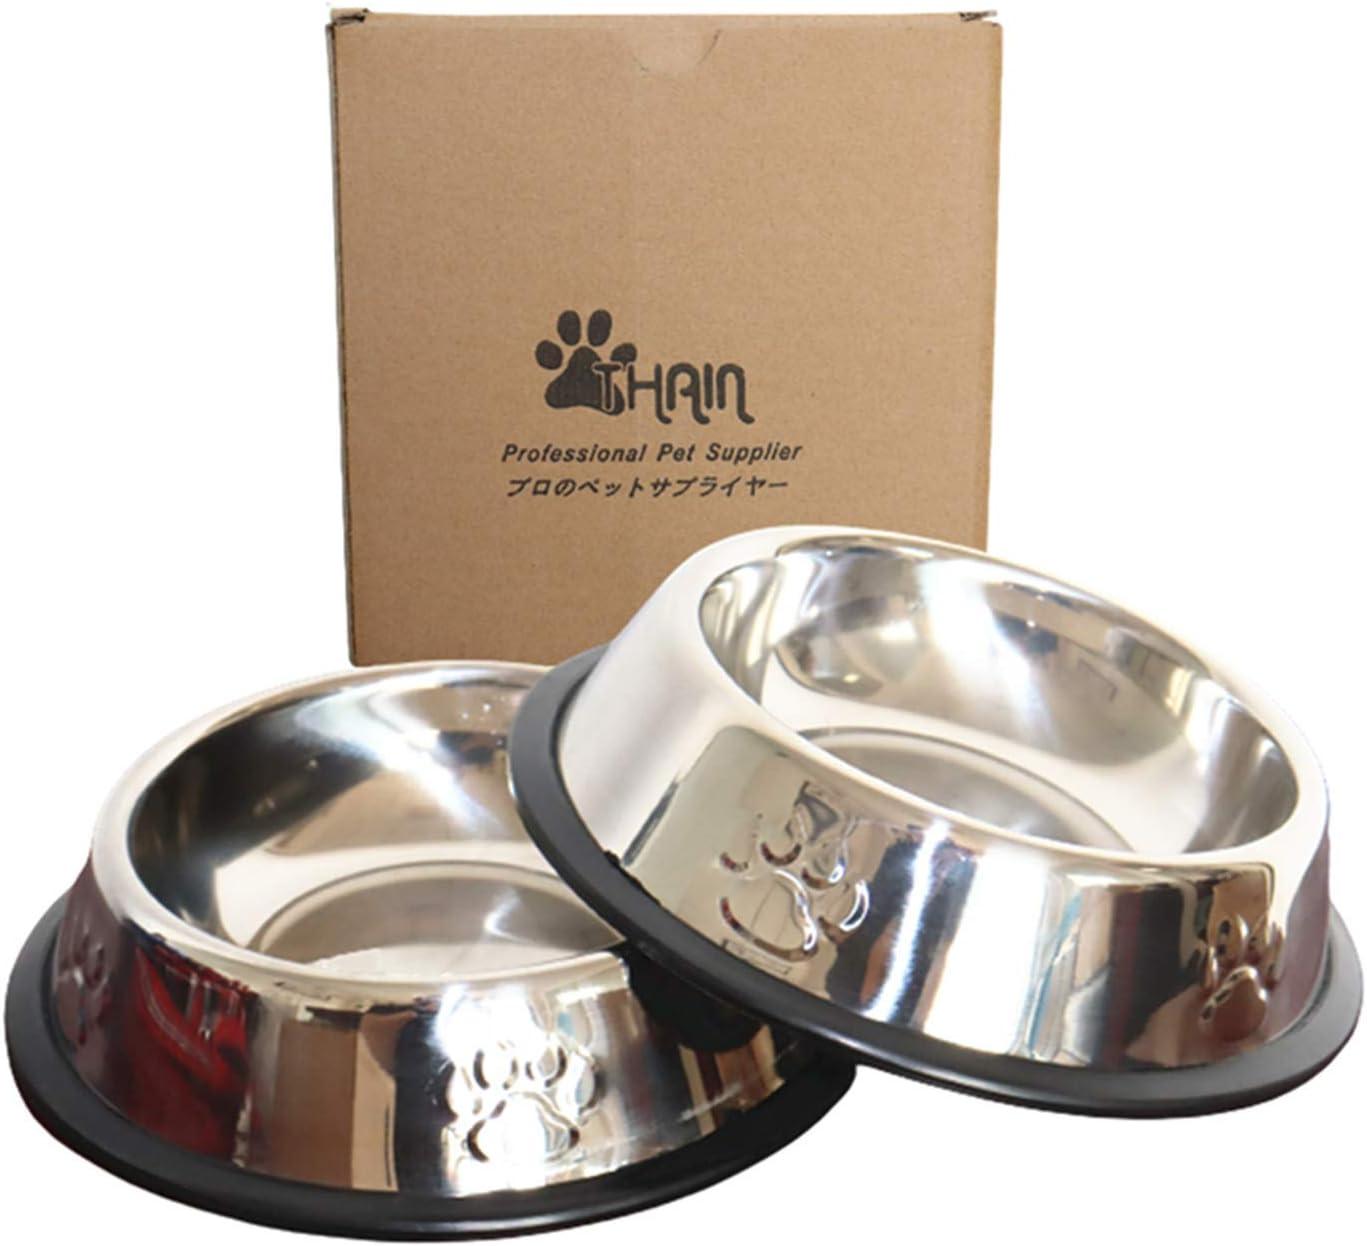 THAIN 2Pcs Cat Bowl Pet Bowl Stainless Steel Cat Food Water Bowl Non-Slip Rubber Base Small Pet Bowl Cat Feeding Bowls (Set of 2